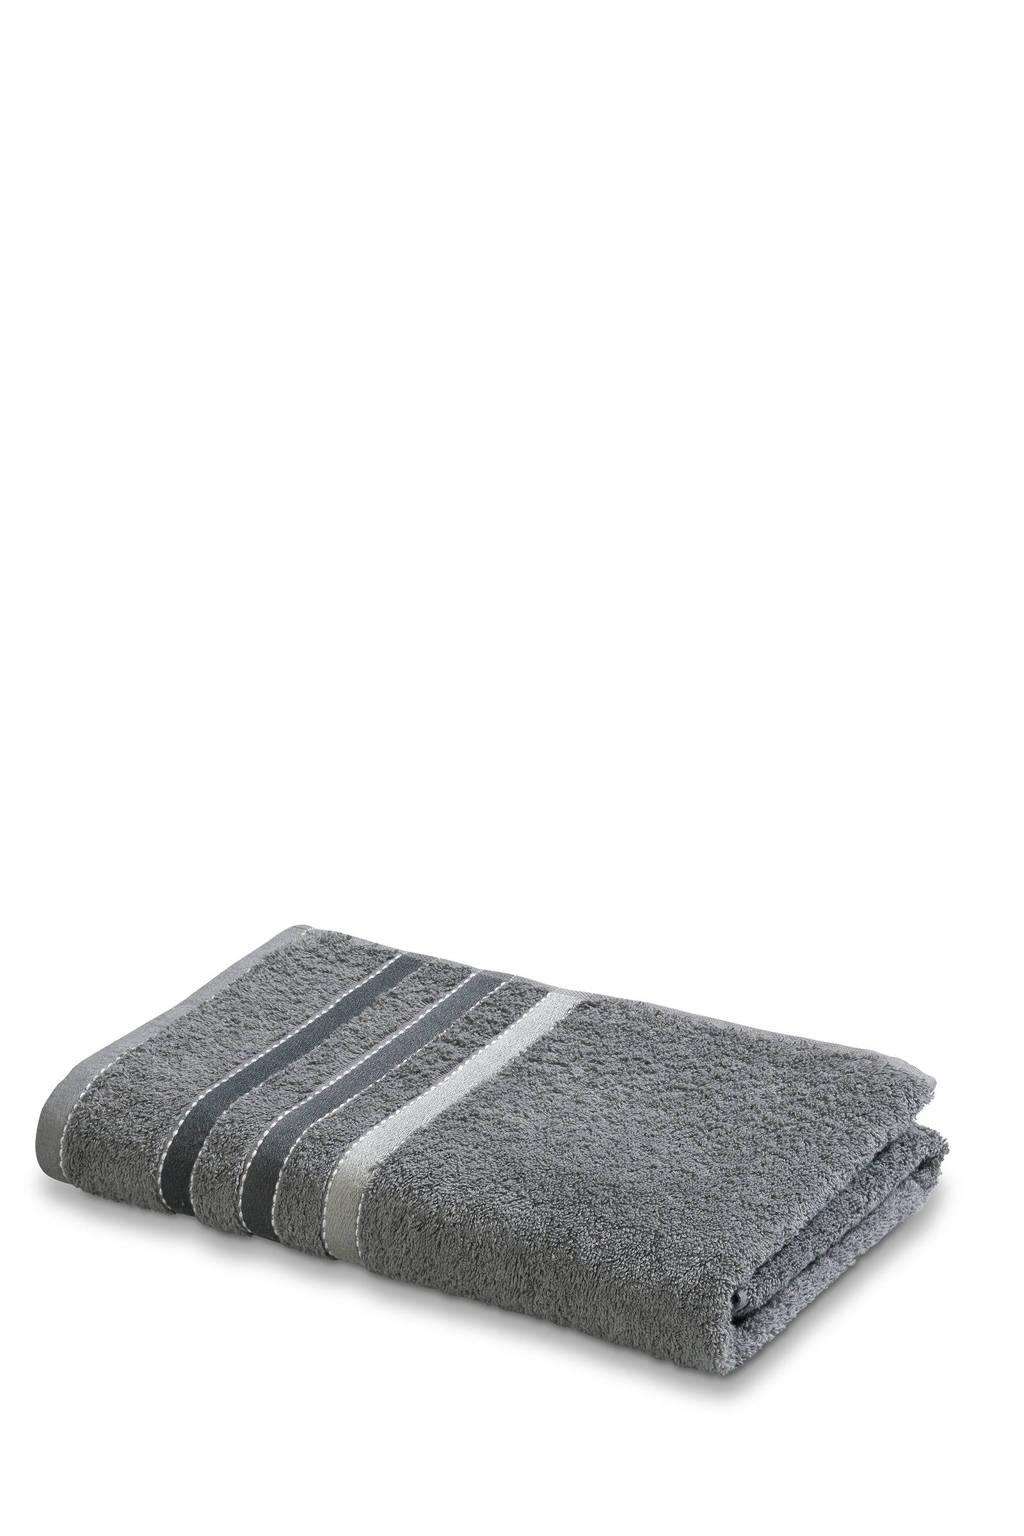 Vandyck badhanddoek (140 x 70 cm) Mole grey, mole grey